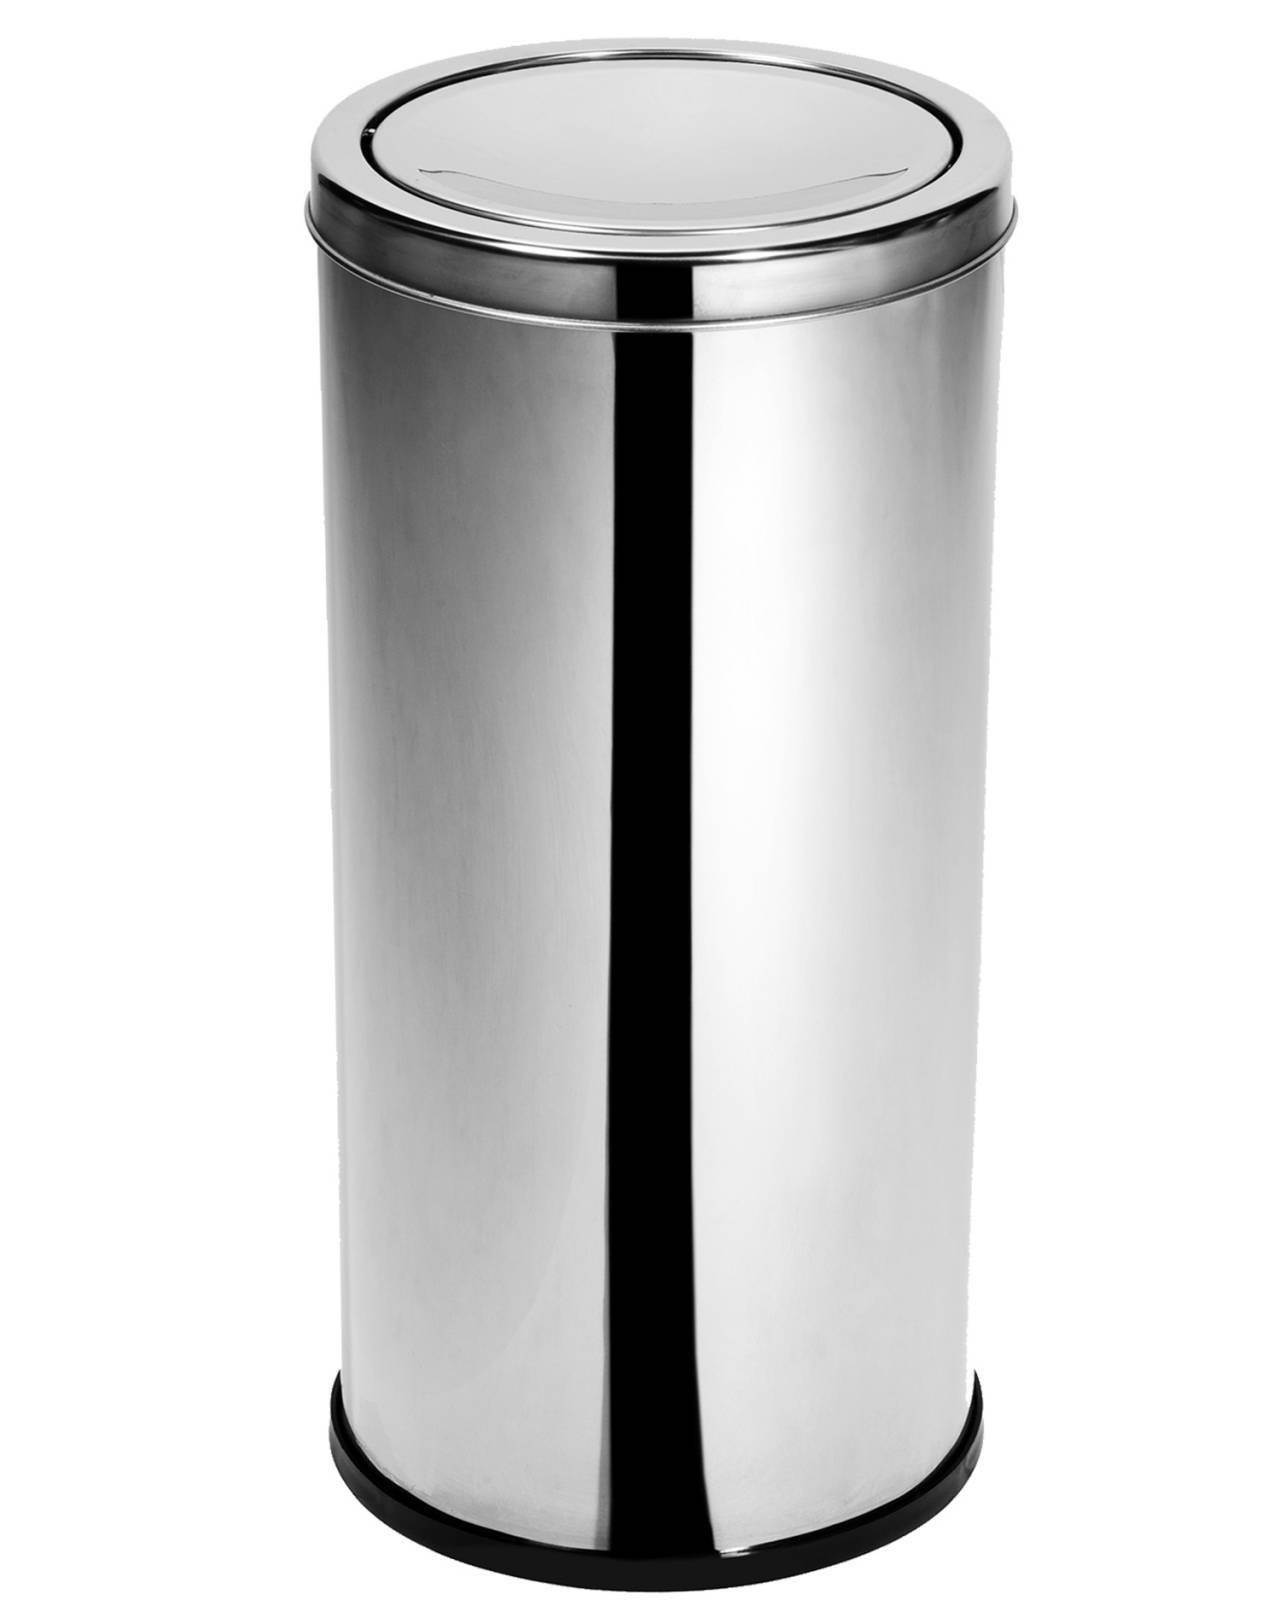 Lixeira Inox 30 cm x 70 cm c/ Tampa Basculante - 50 Litros Elegance